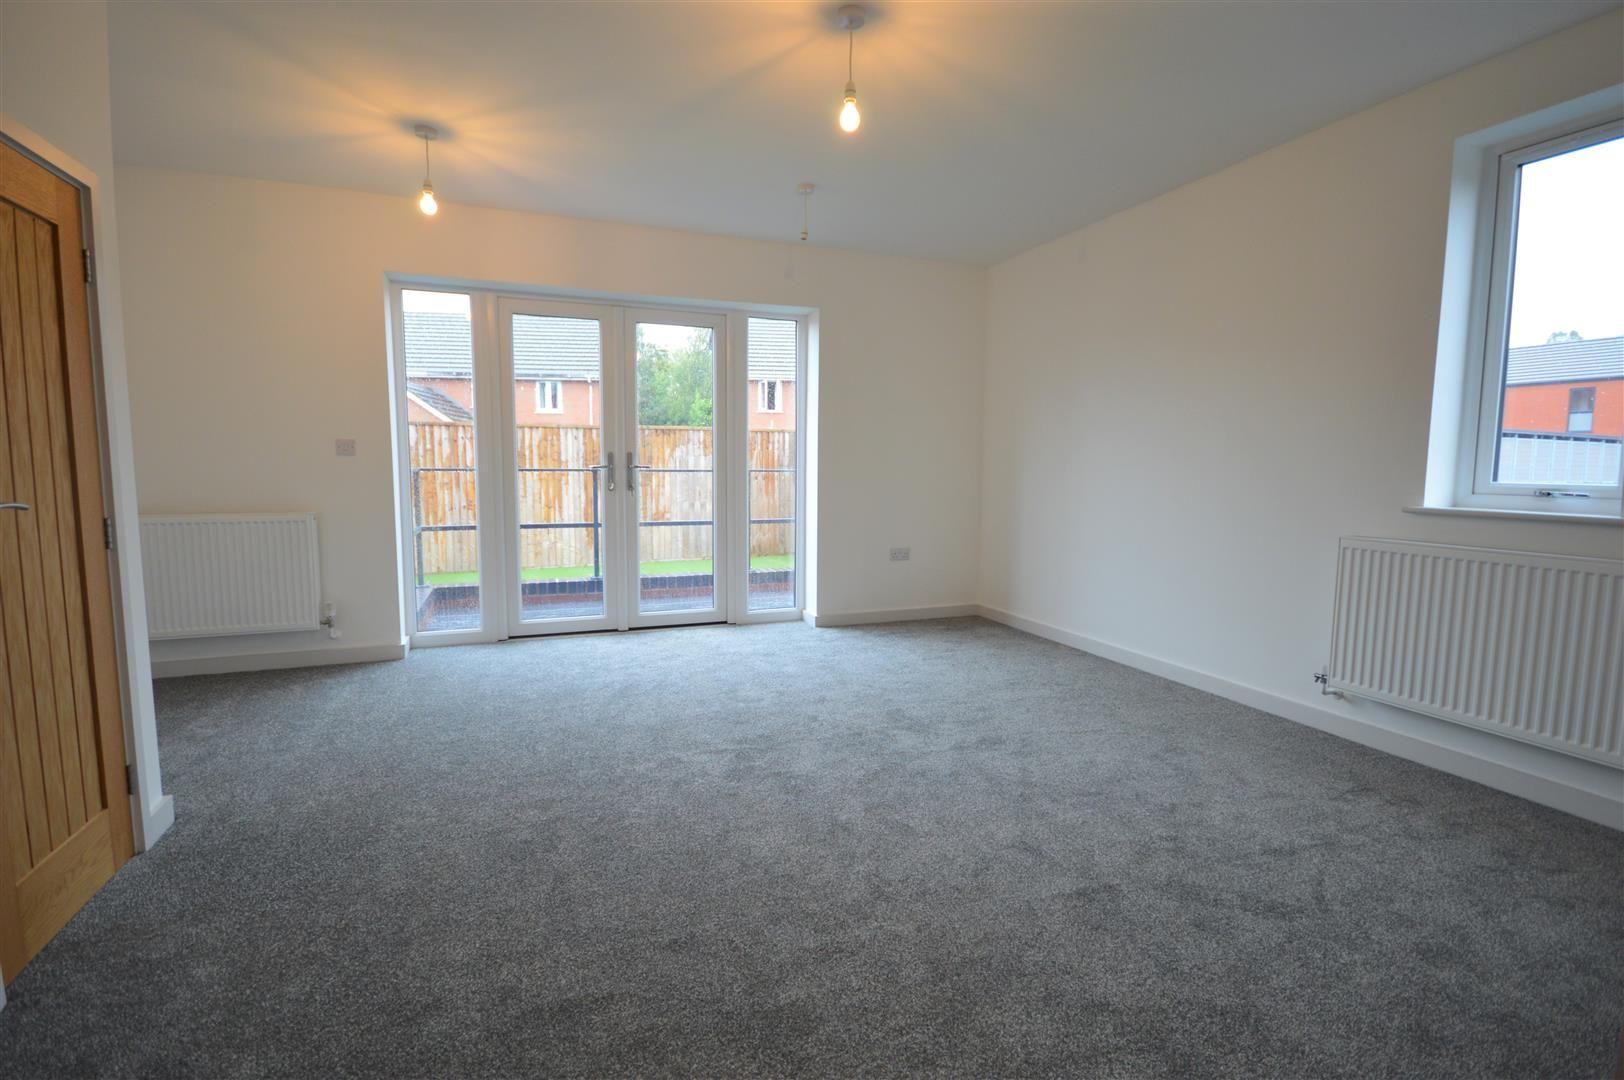 2 bed detached for sale in Leominster 4